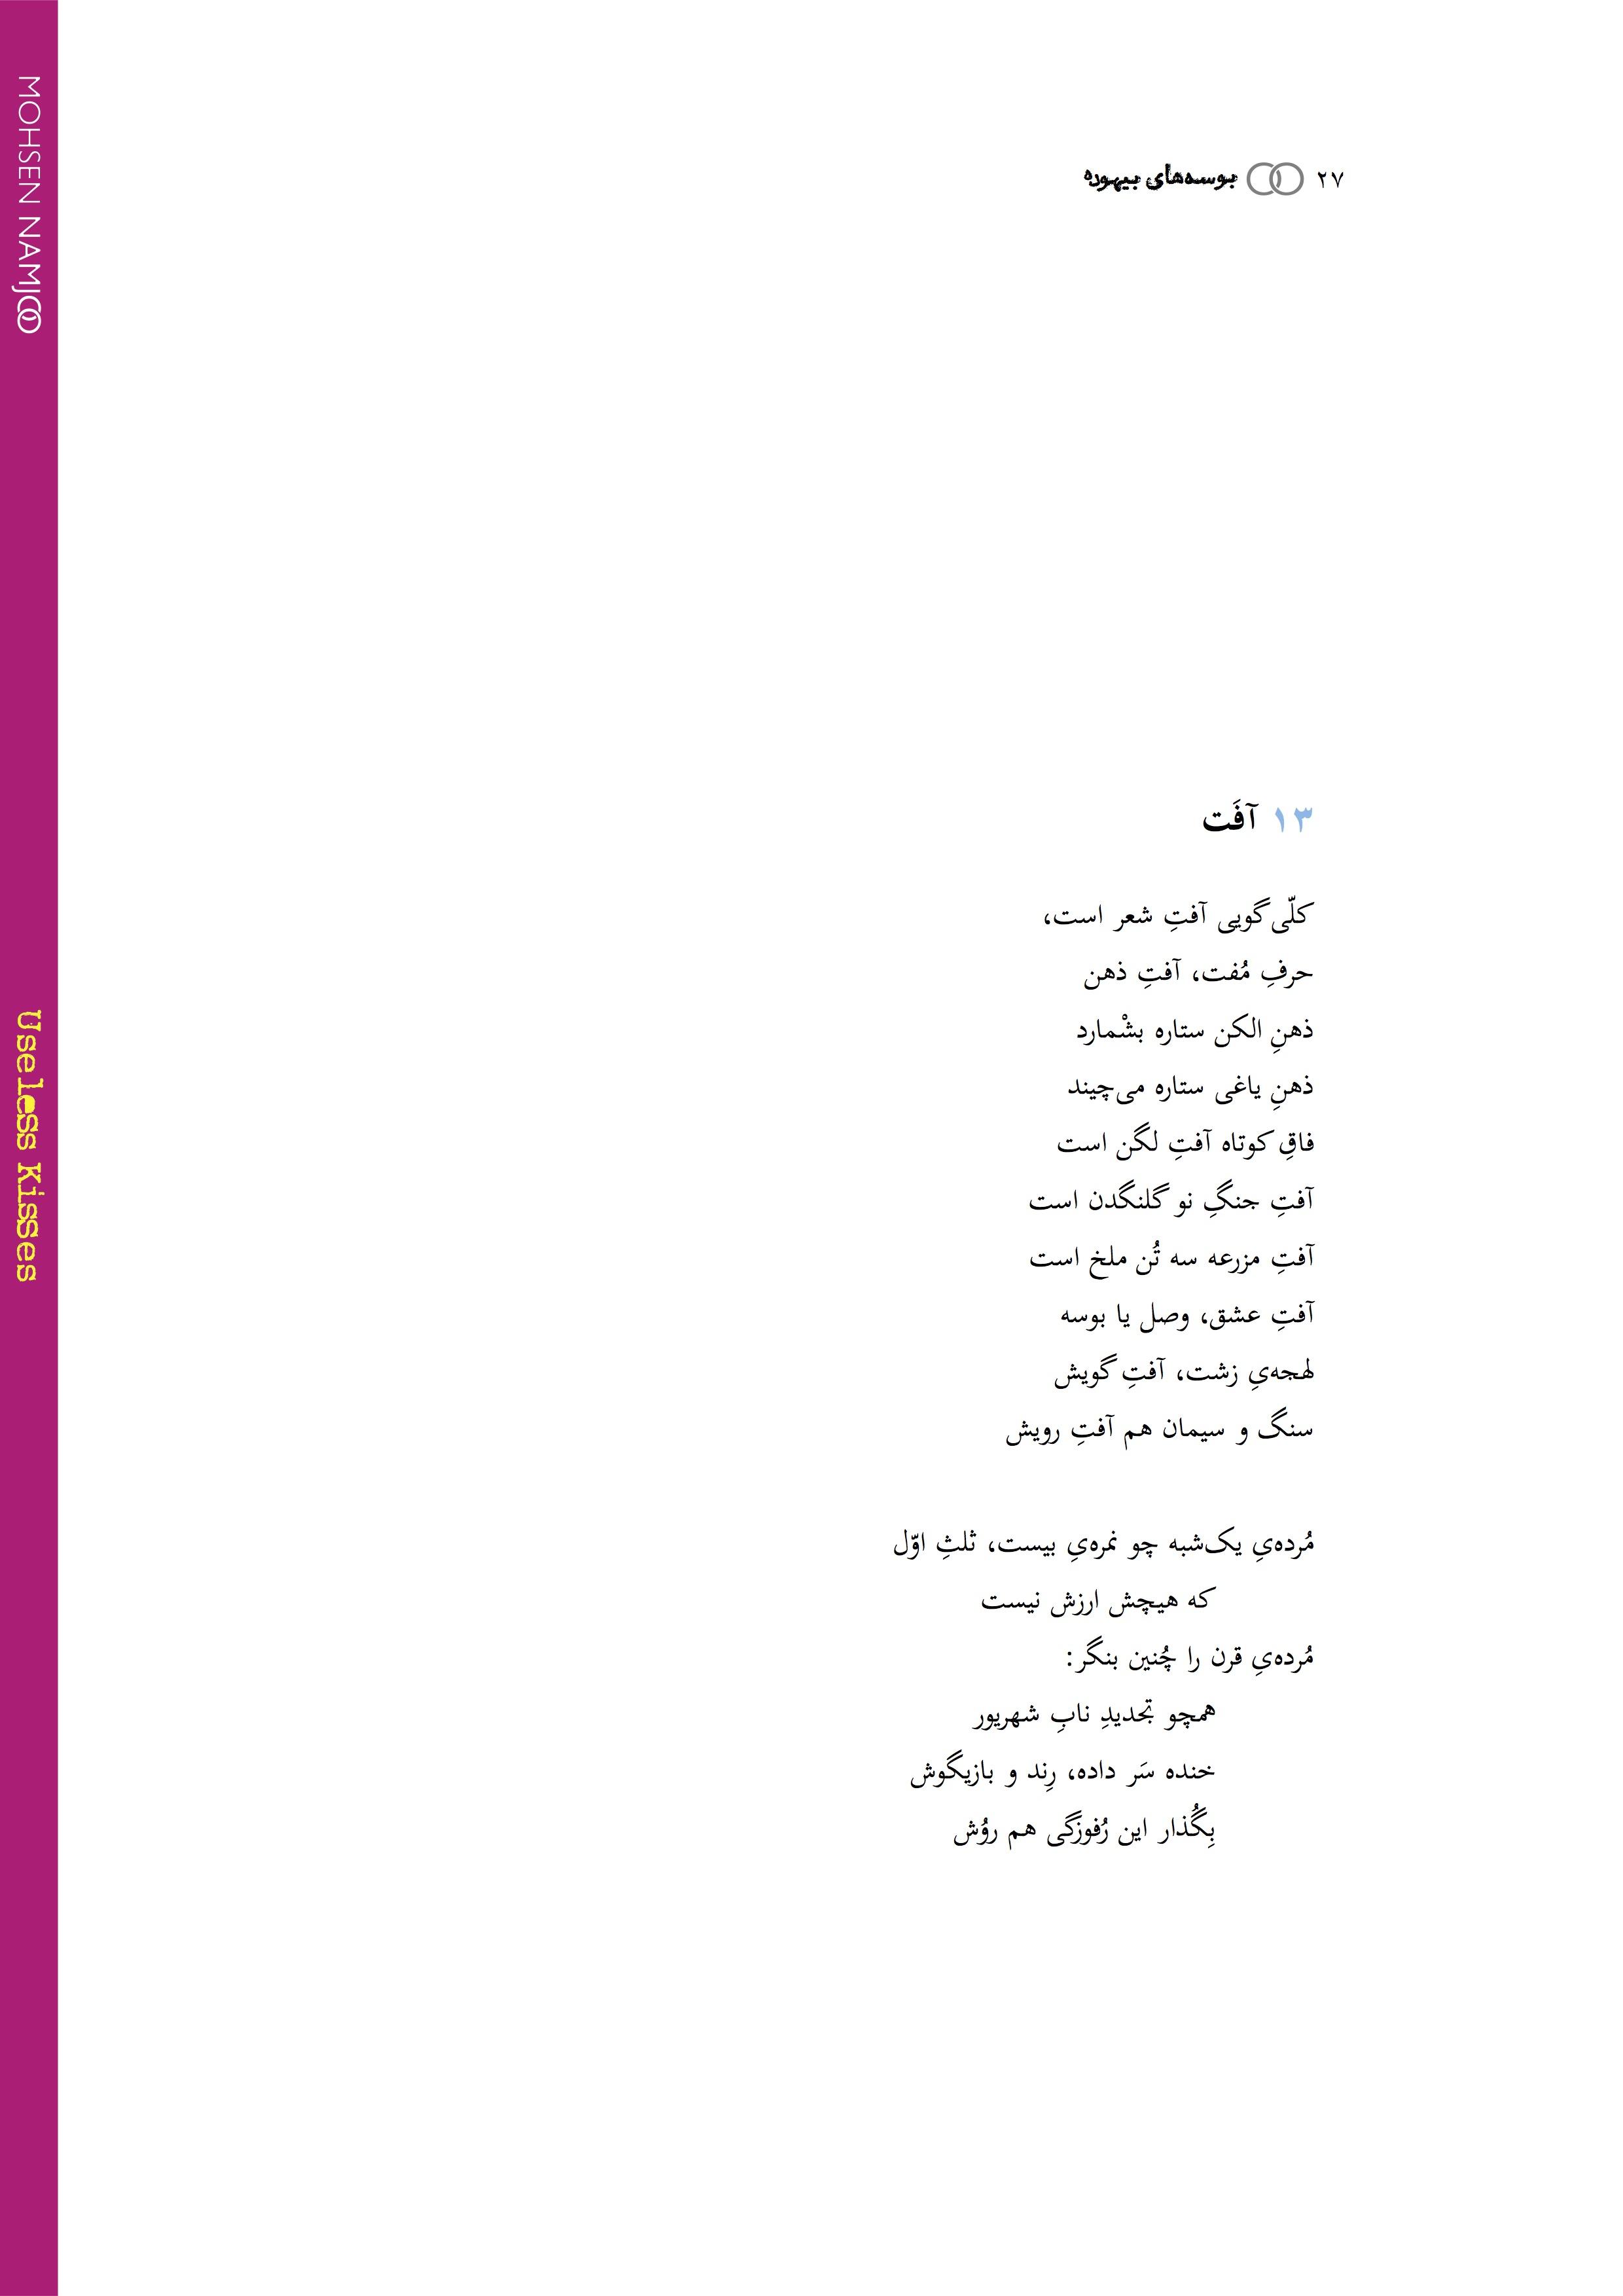 26Useless Kisses eBook (2nd Edition).jpg